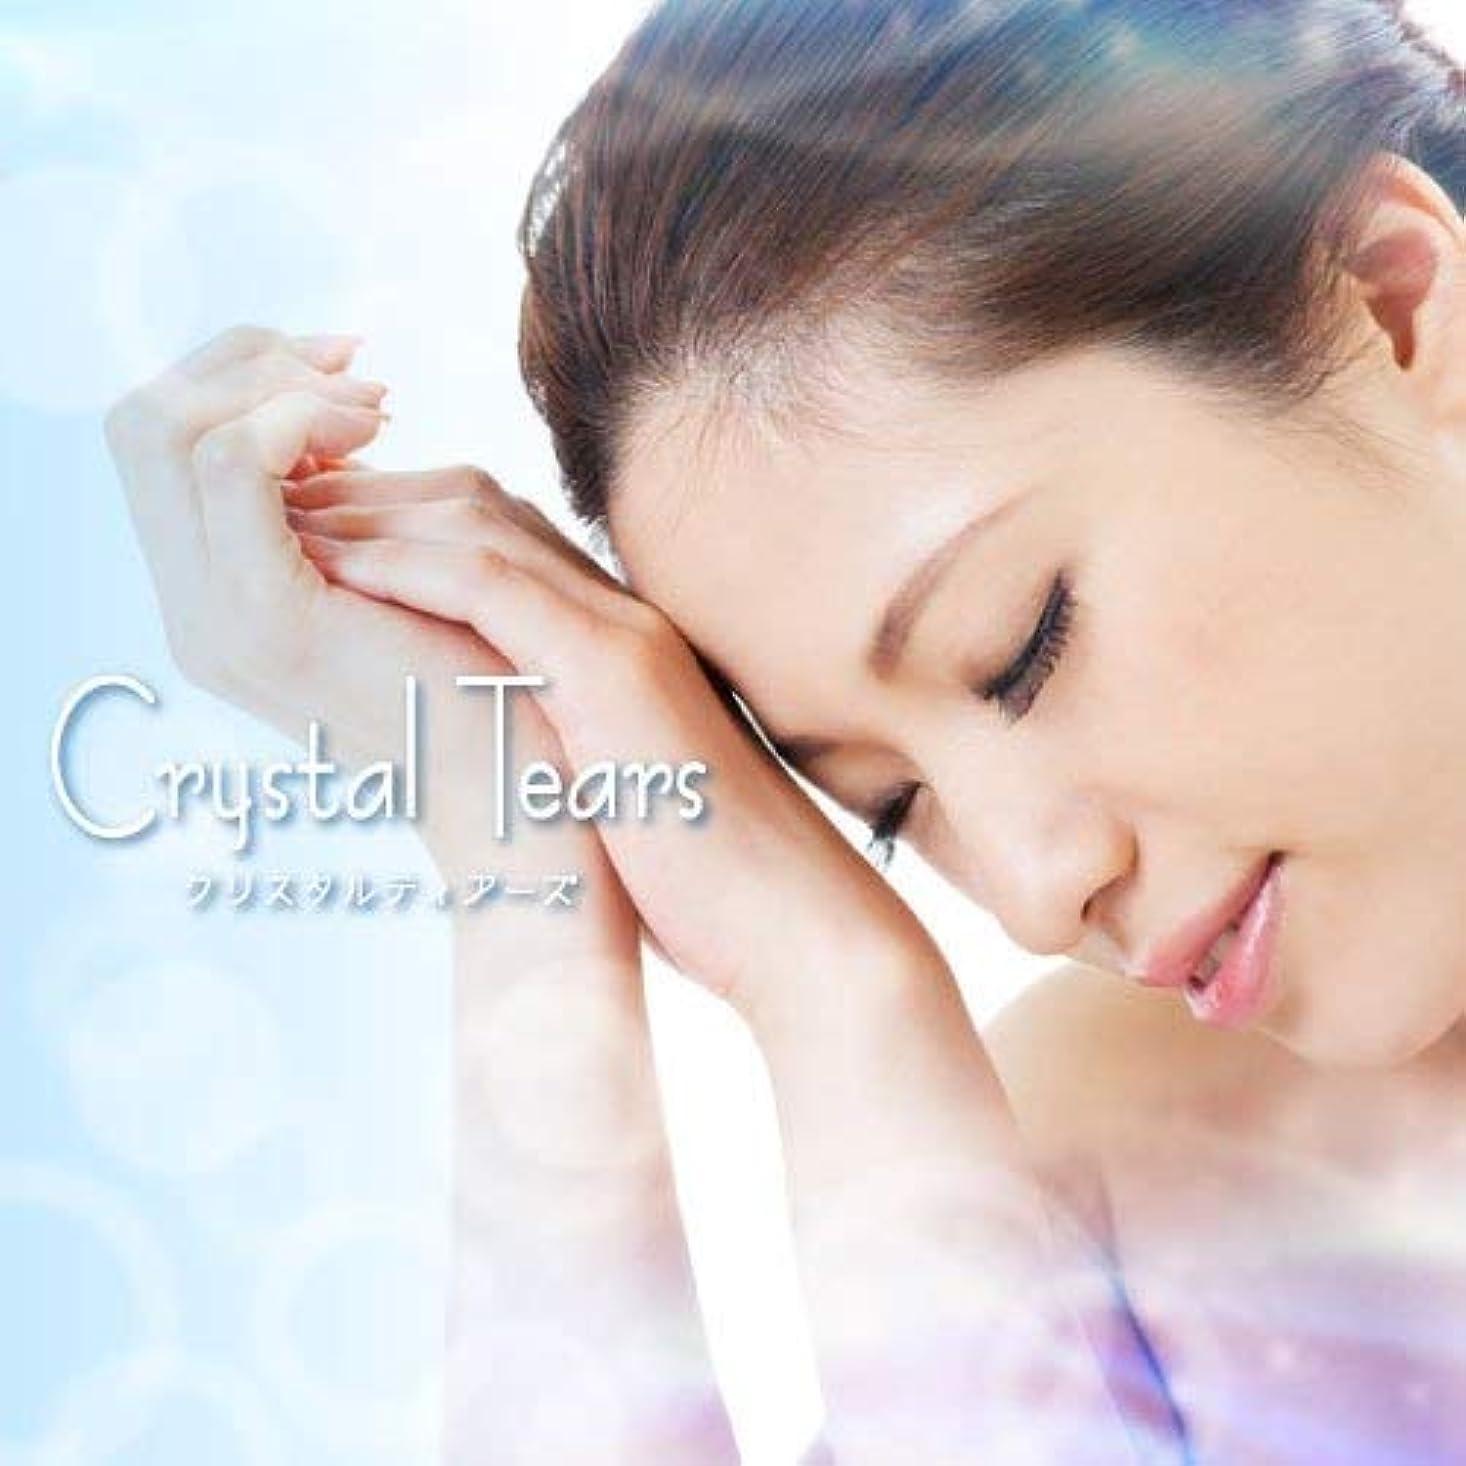 Crystal Tears(クリスタル ティアーズ)